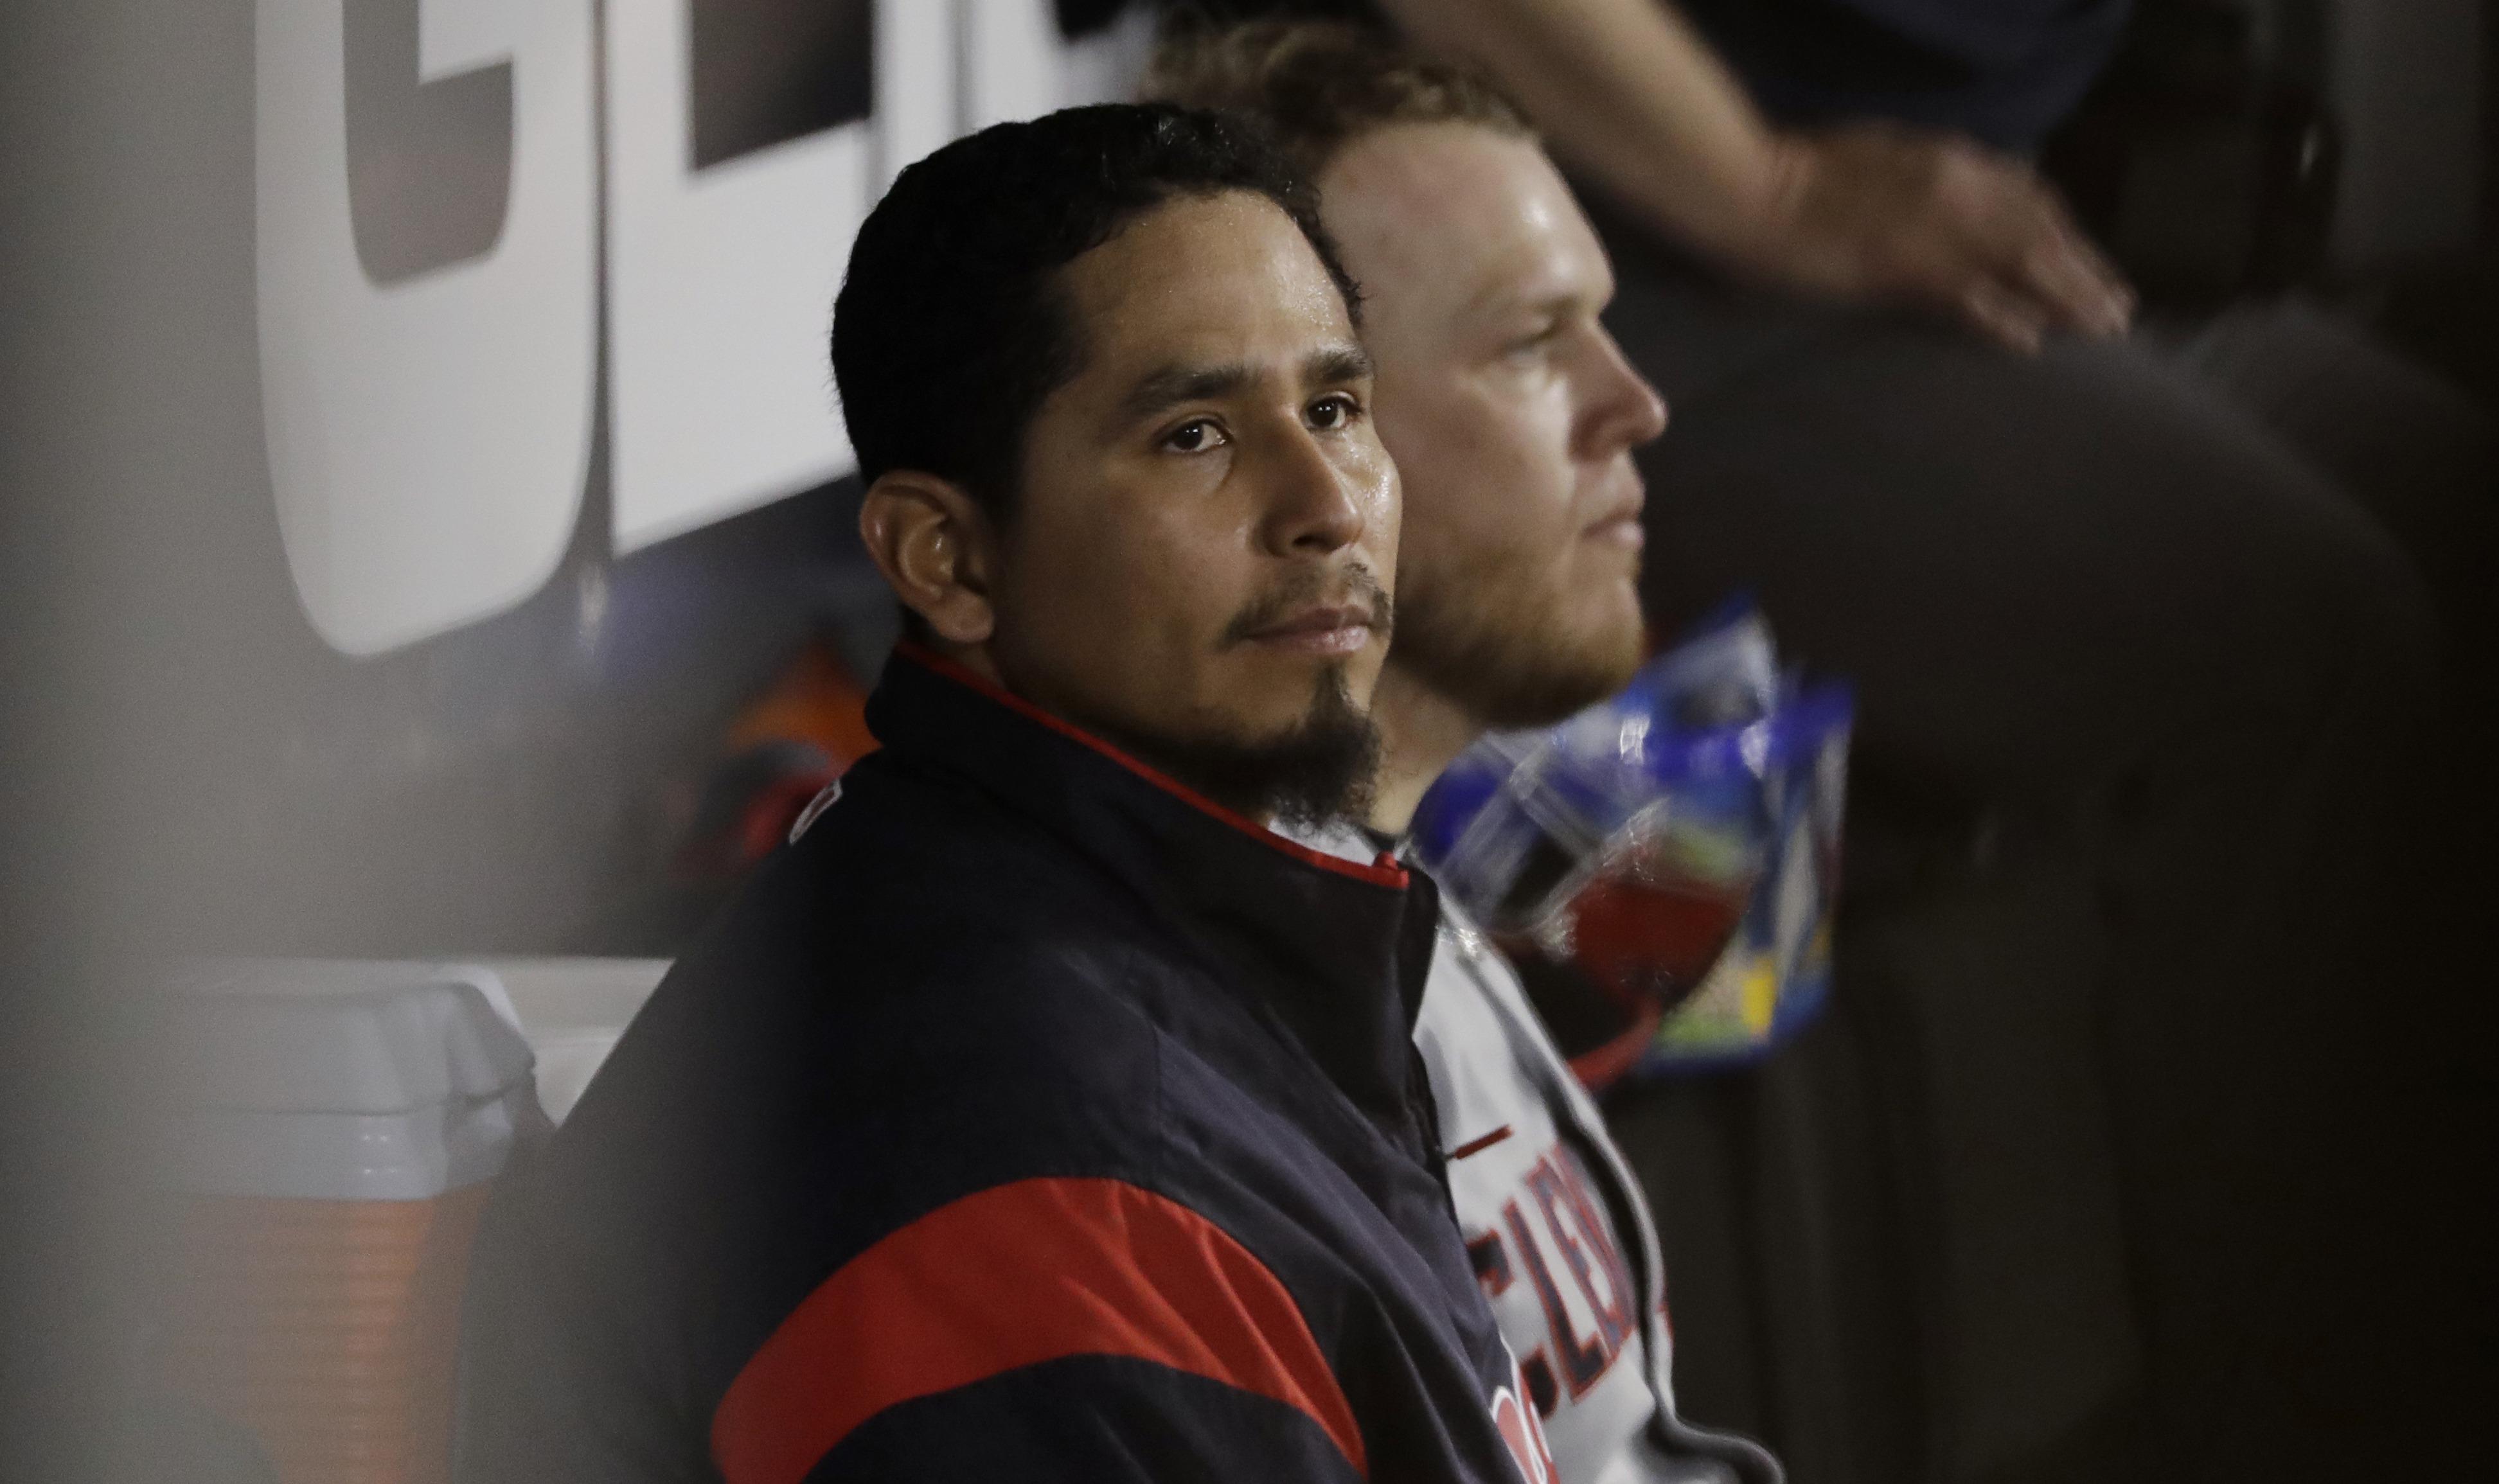 Pitcher Carlos Carrasco revela que padece leucemia